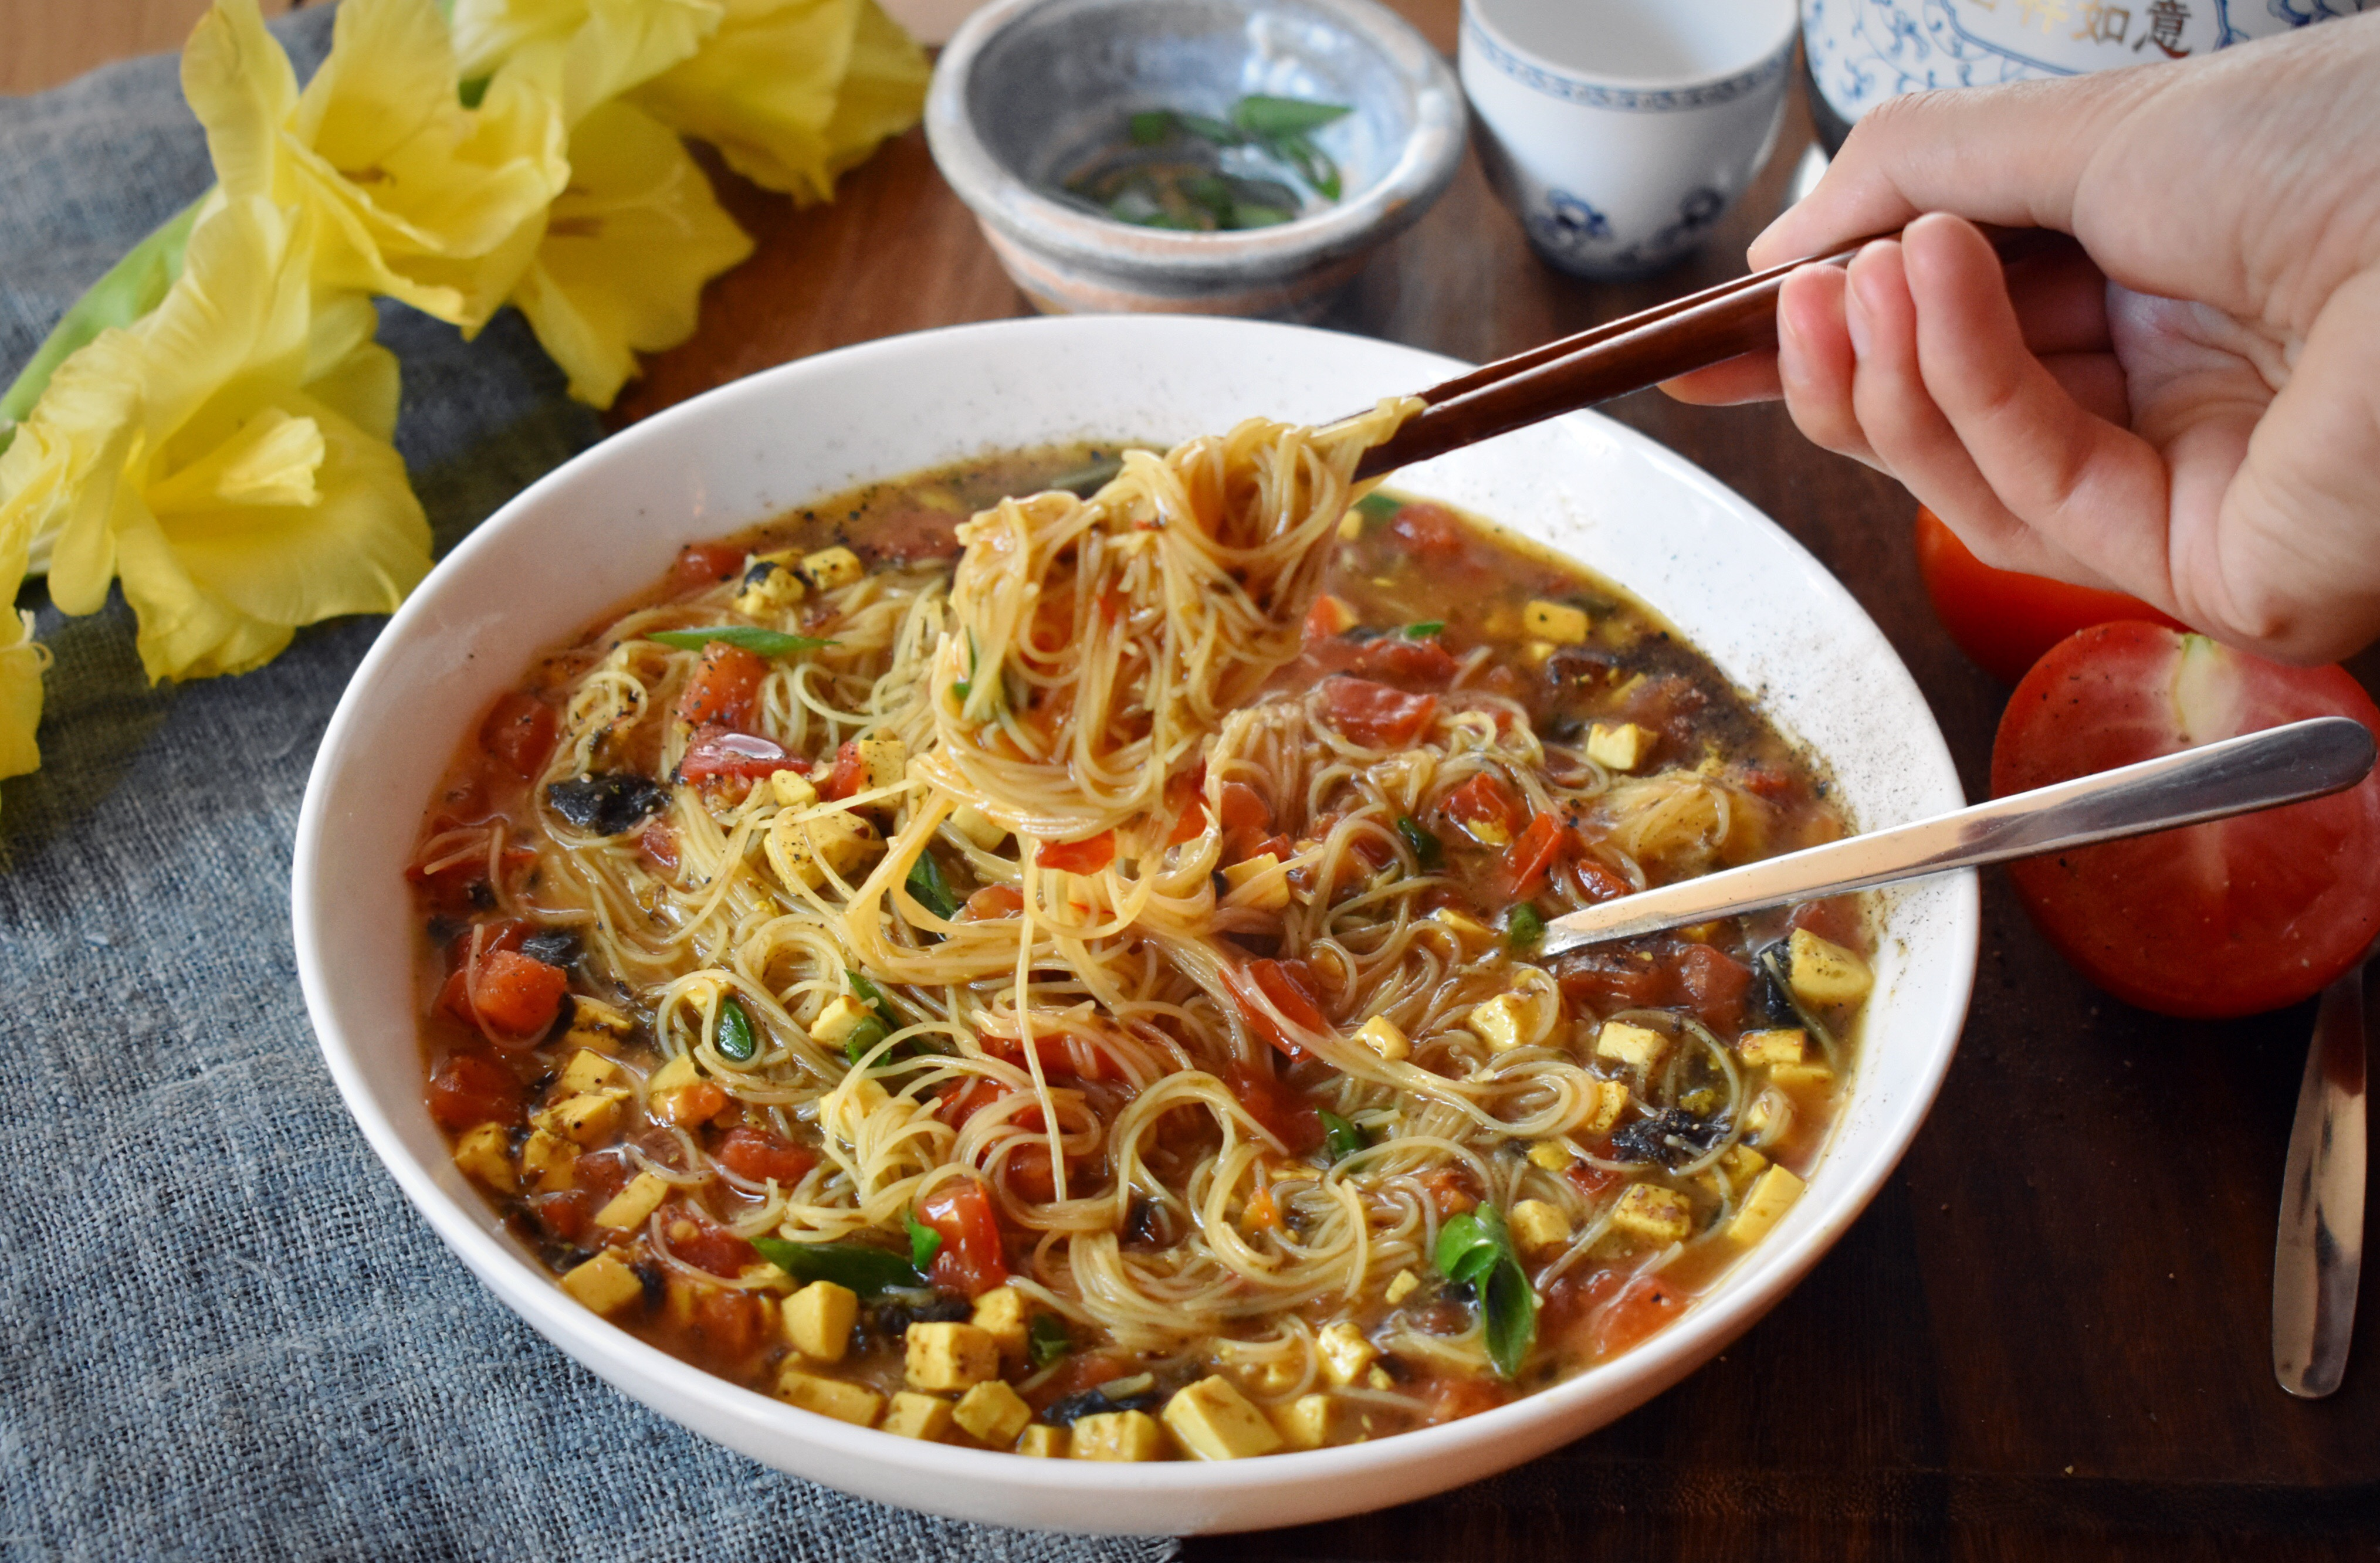 Tomato & Tofu Chinese Noodle Soup